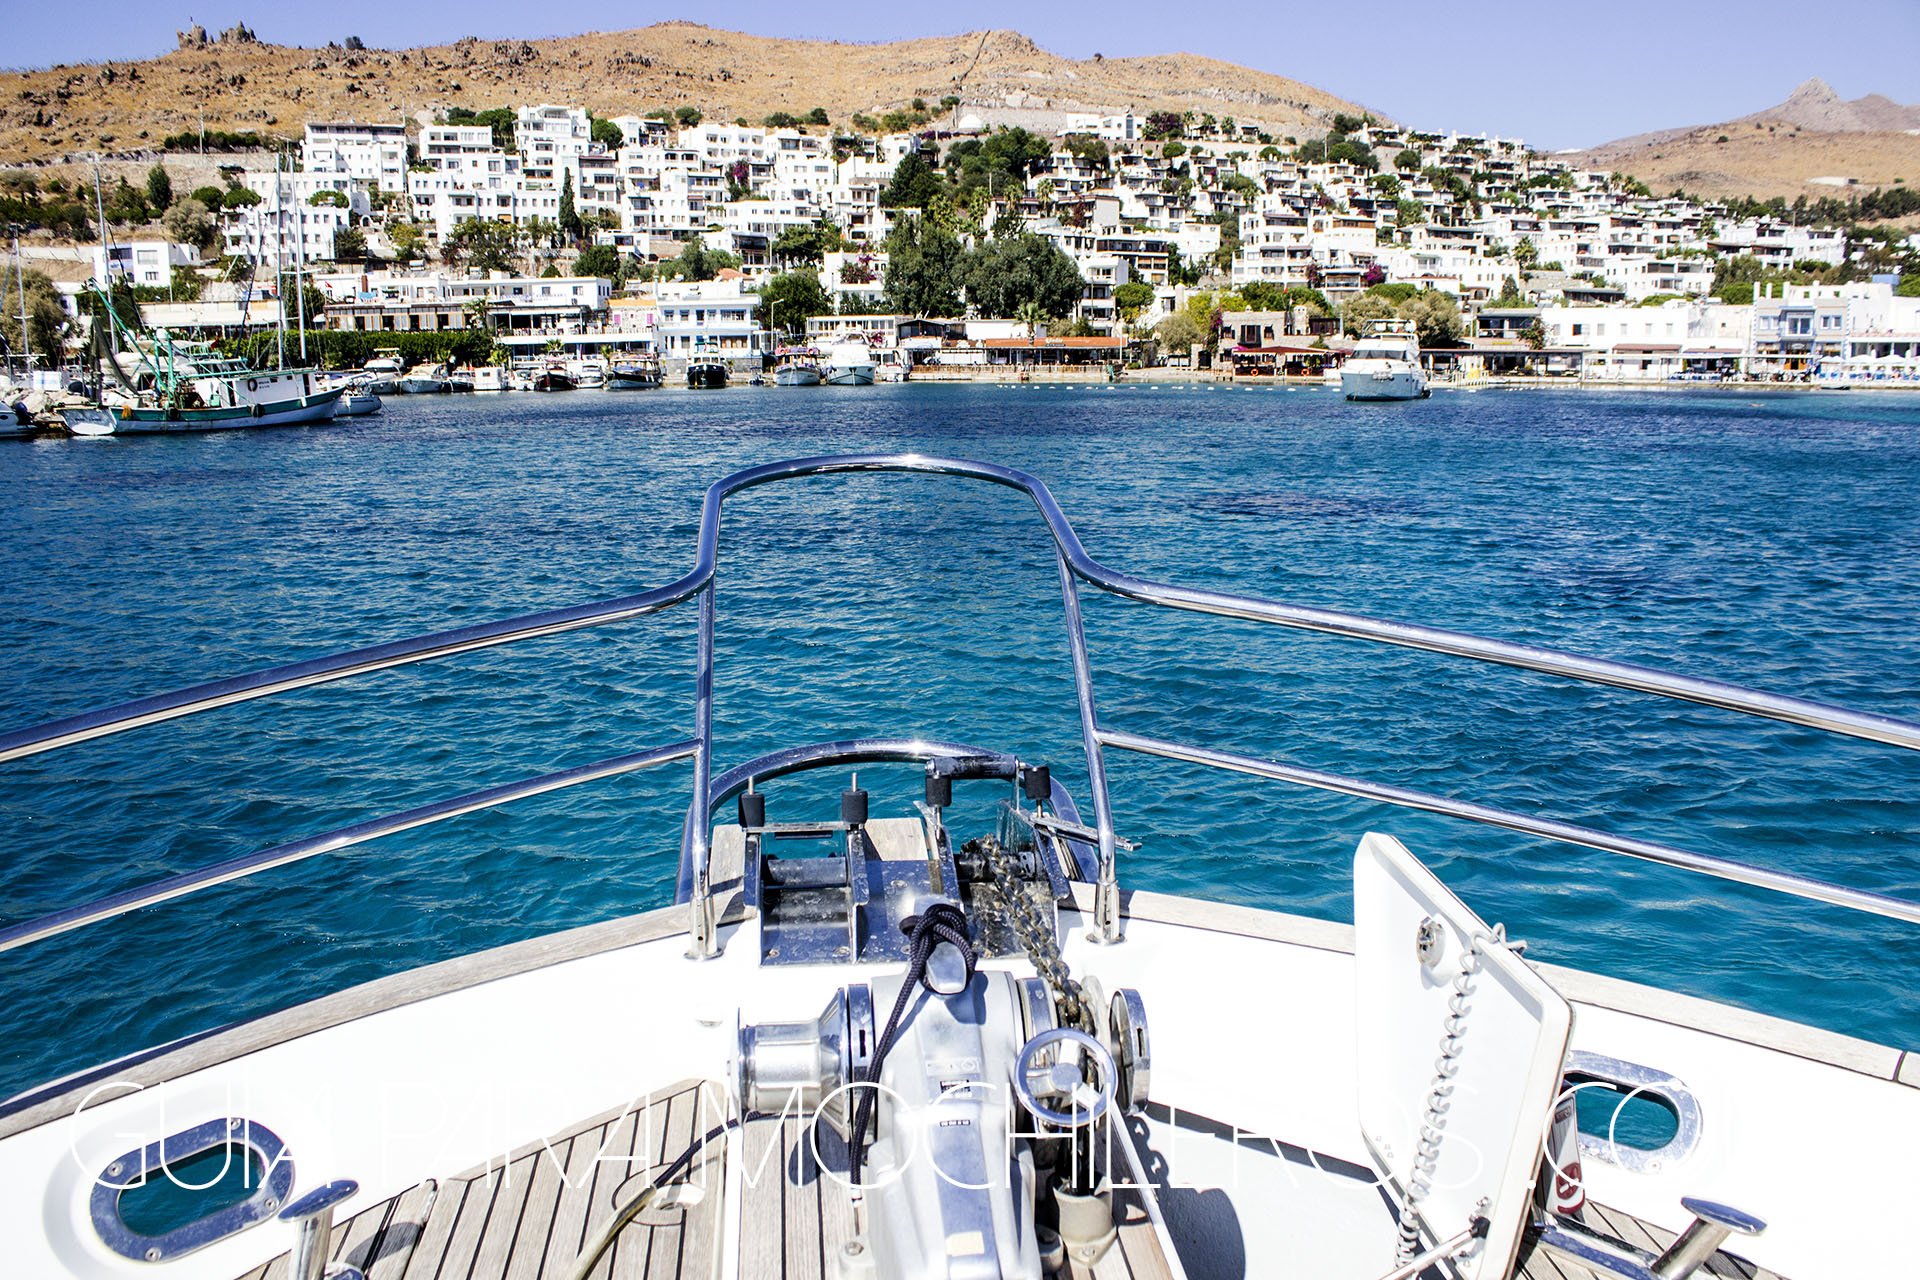 Viaje gratis en barco